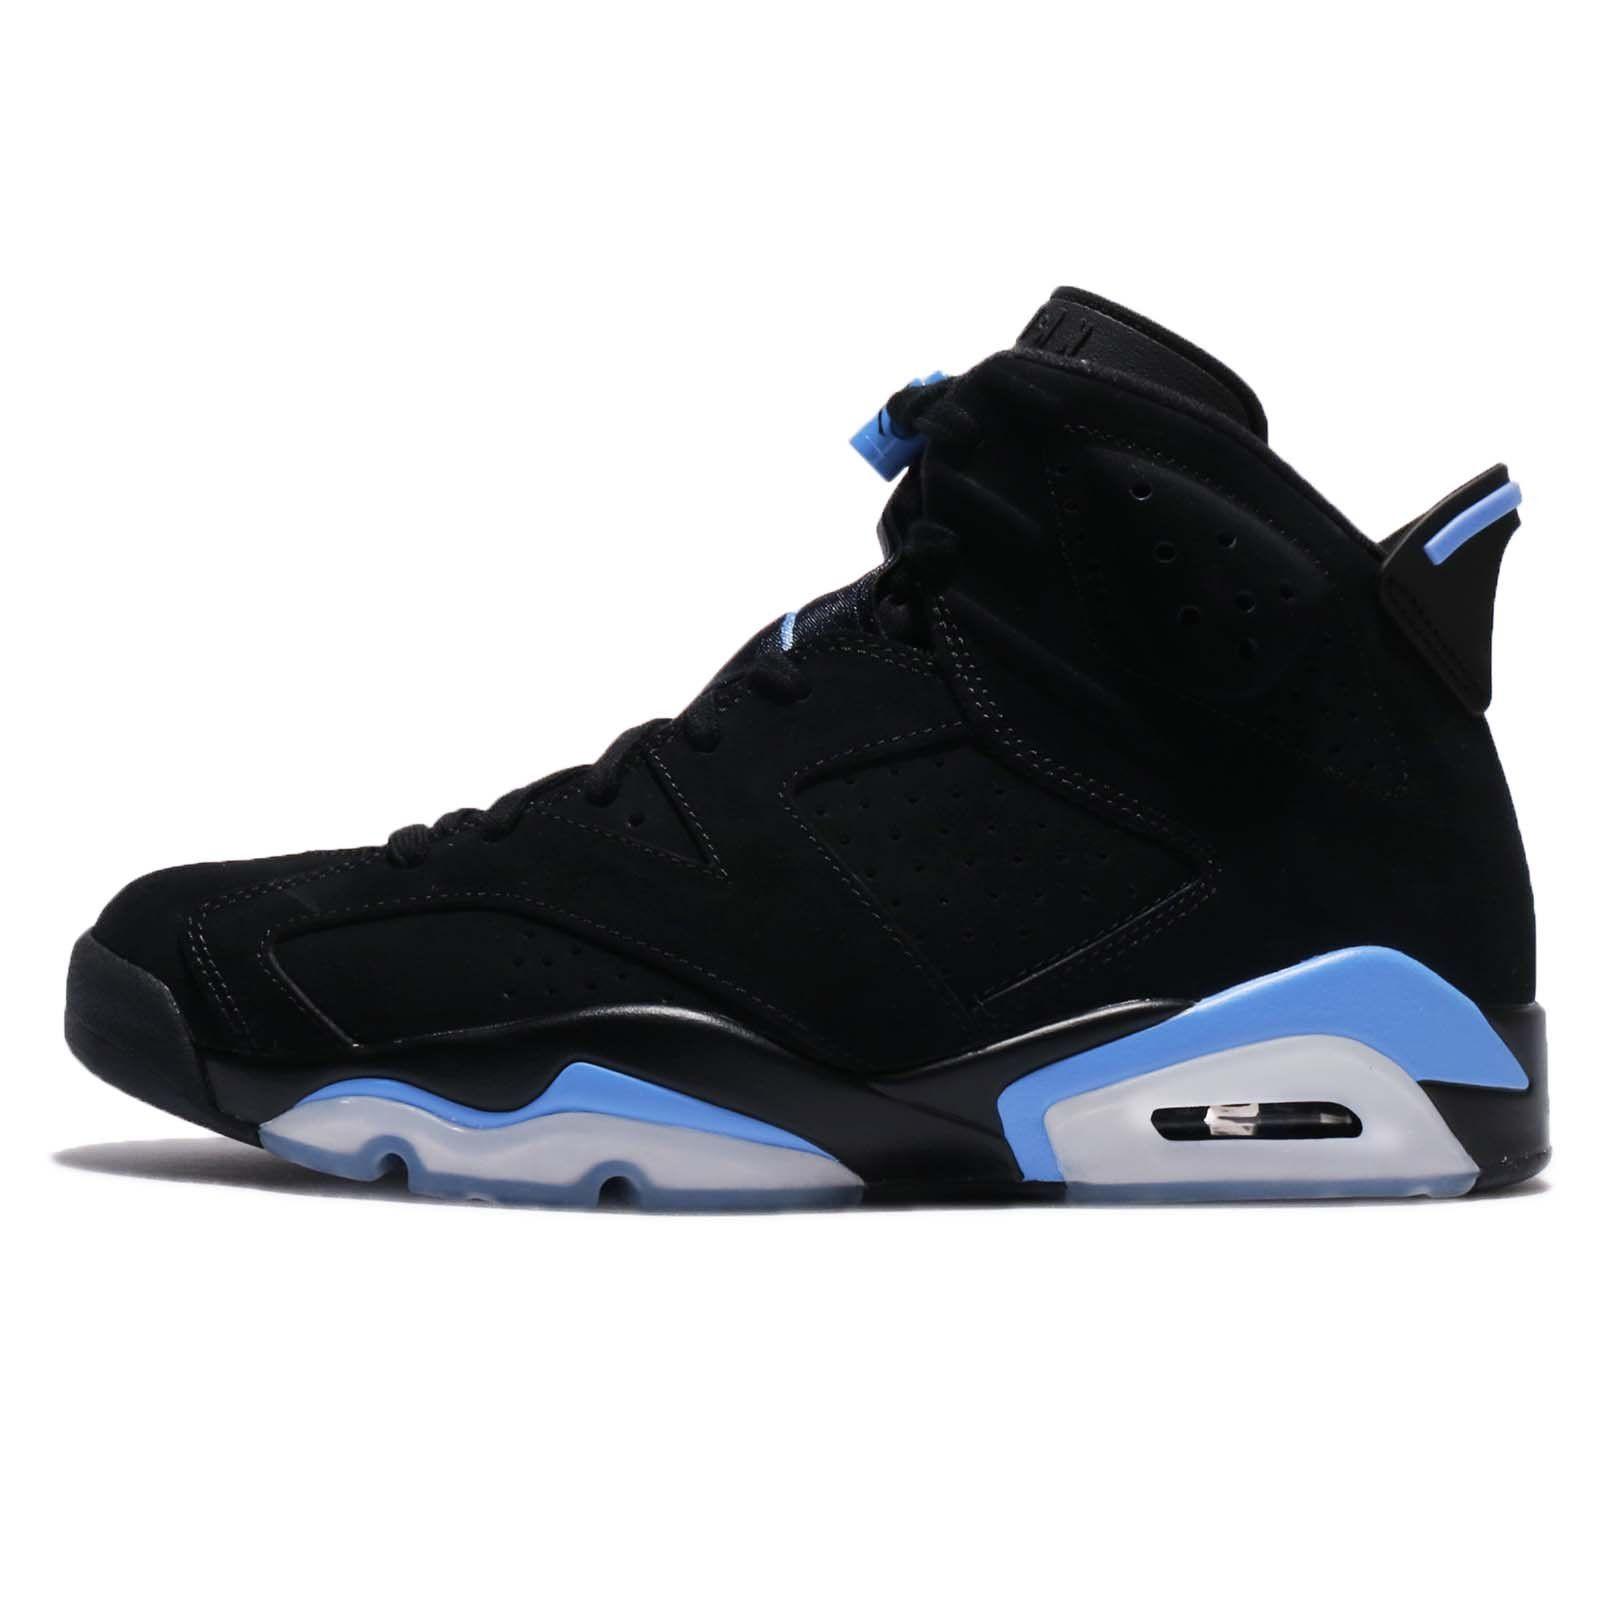 Jordan Retro 6 Unc Black University Blue 8 Us Learn More By Visiting The Image Link This Is An Affili Jordan Shoes For Men Air Jordans Retro Jordan Retro